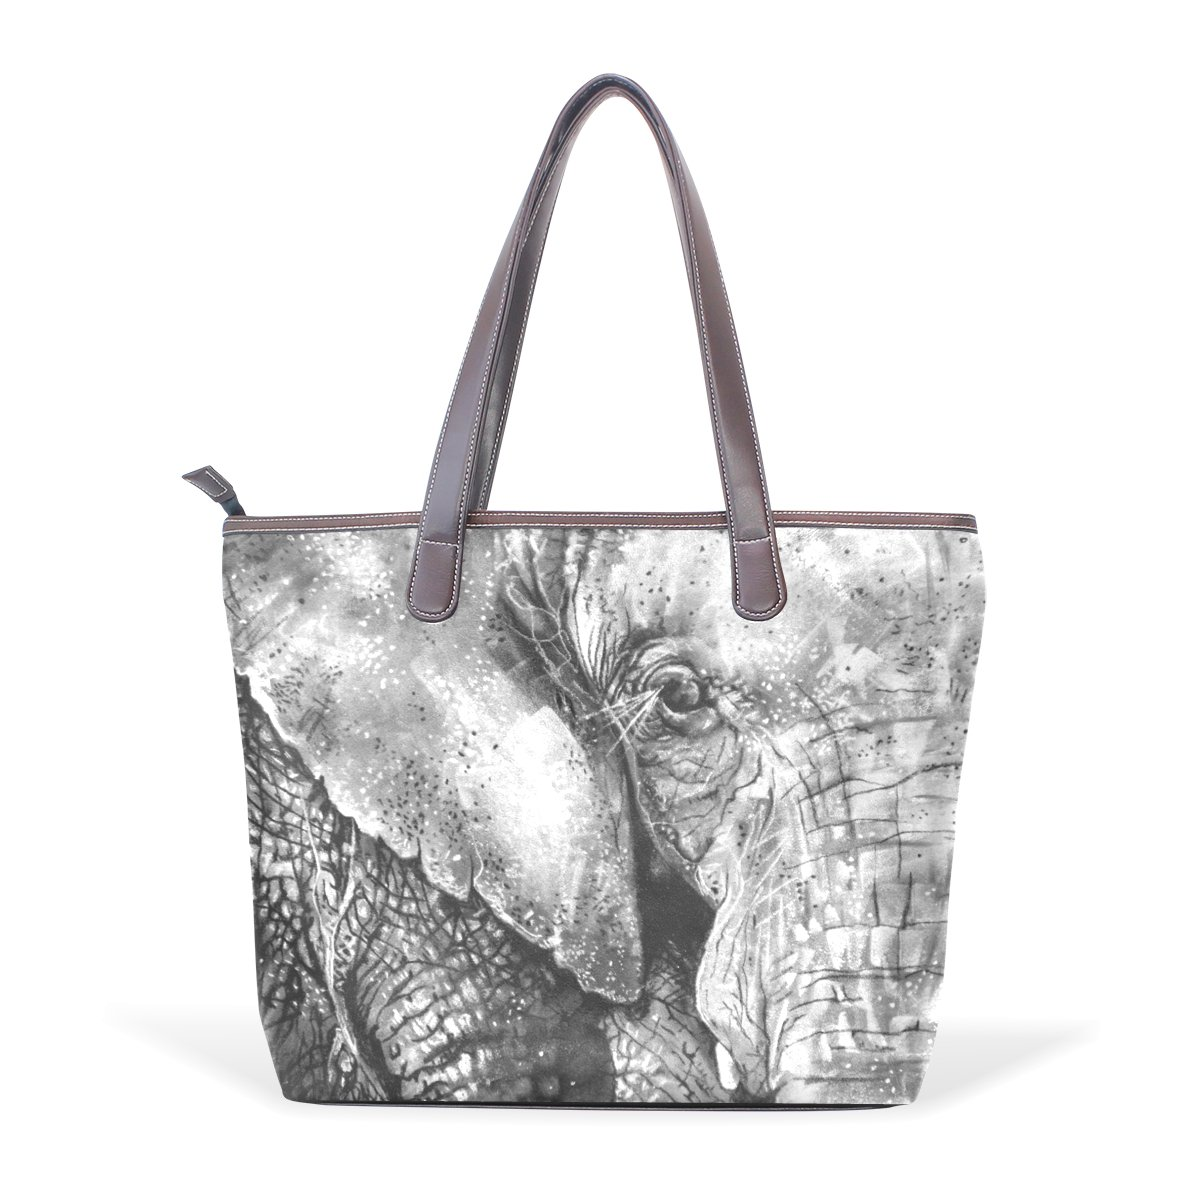 Ye Store Sumatran Elephant Lady PU Leather Handbag Tote Bag Shoulder Bag Shopping Bag